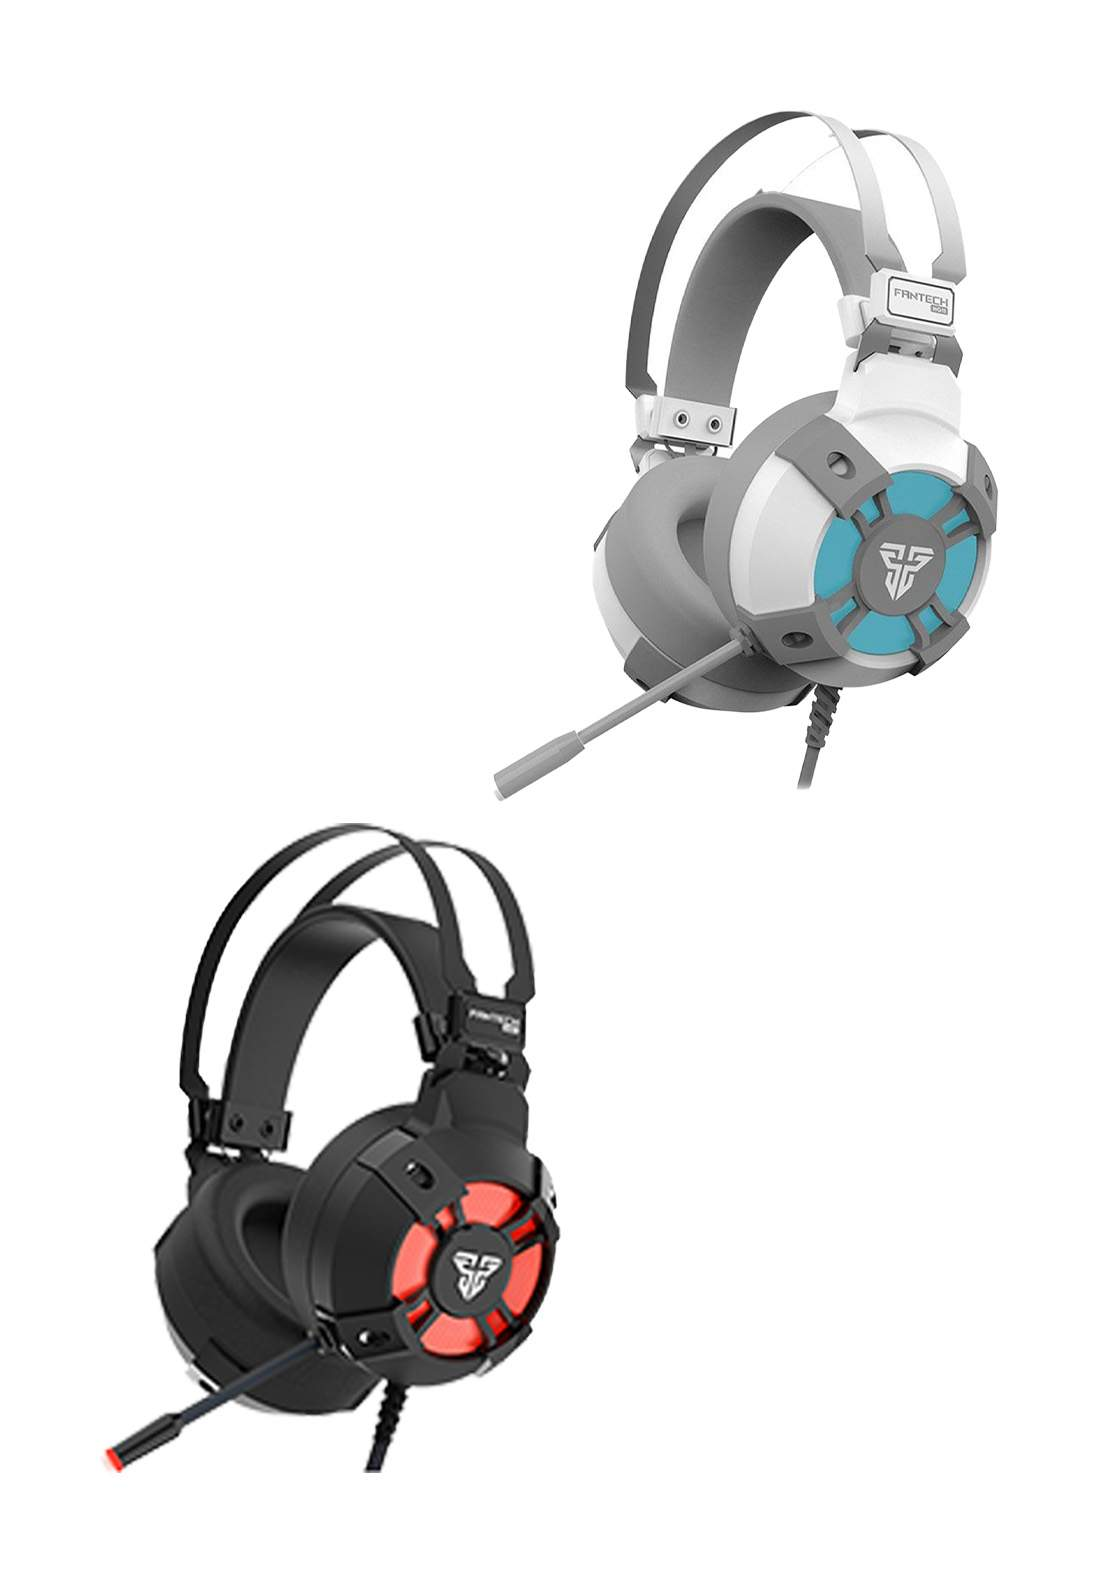 Fantech HG11 Captain 7.1 Gaming Headset سماعة